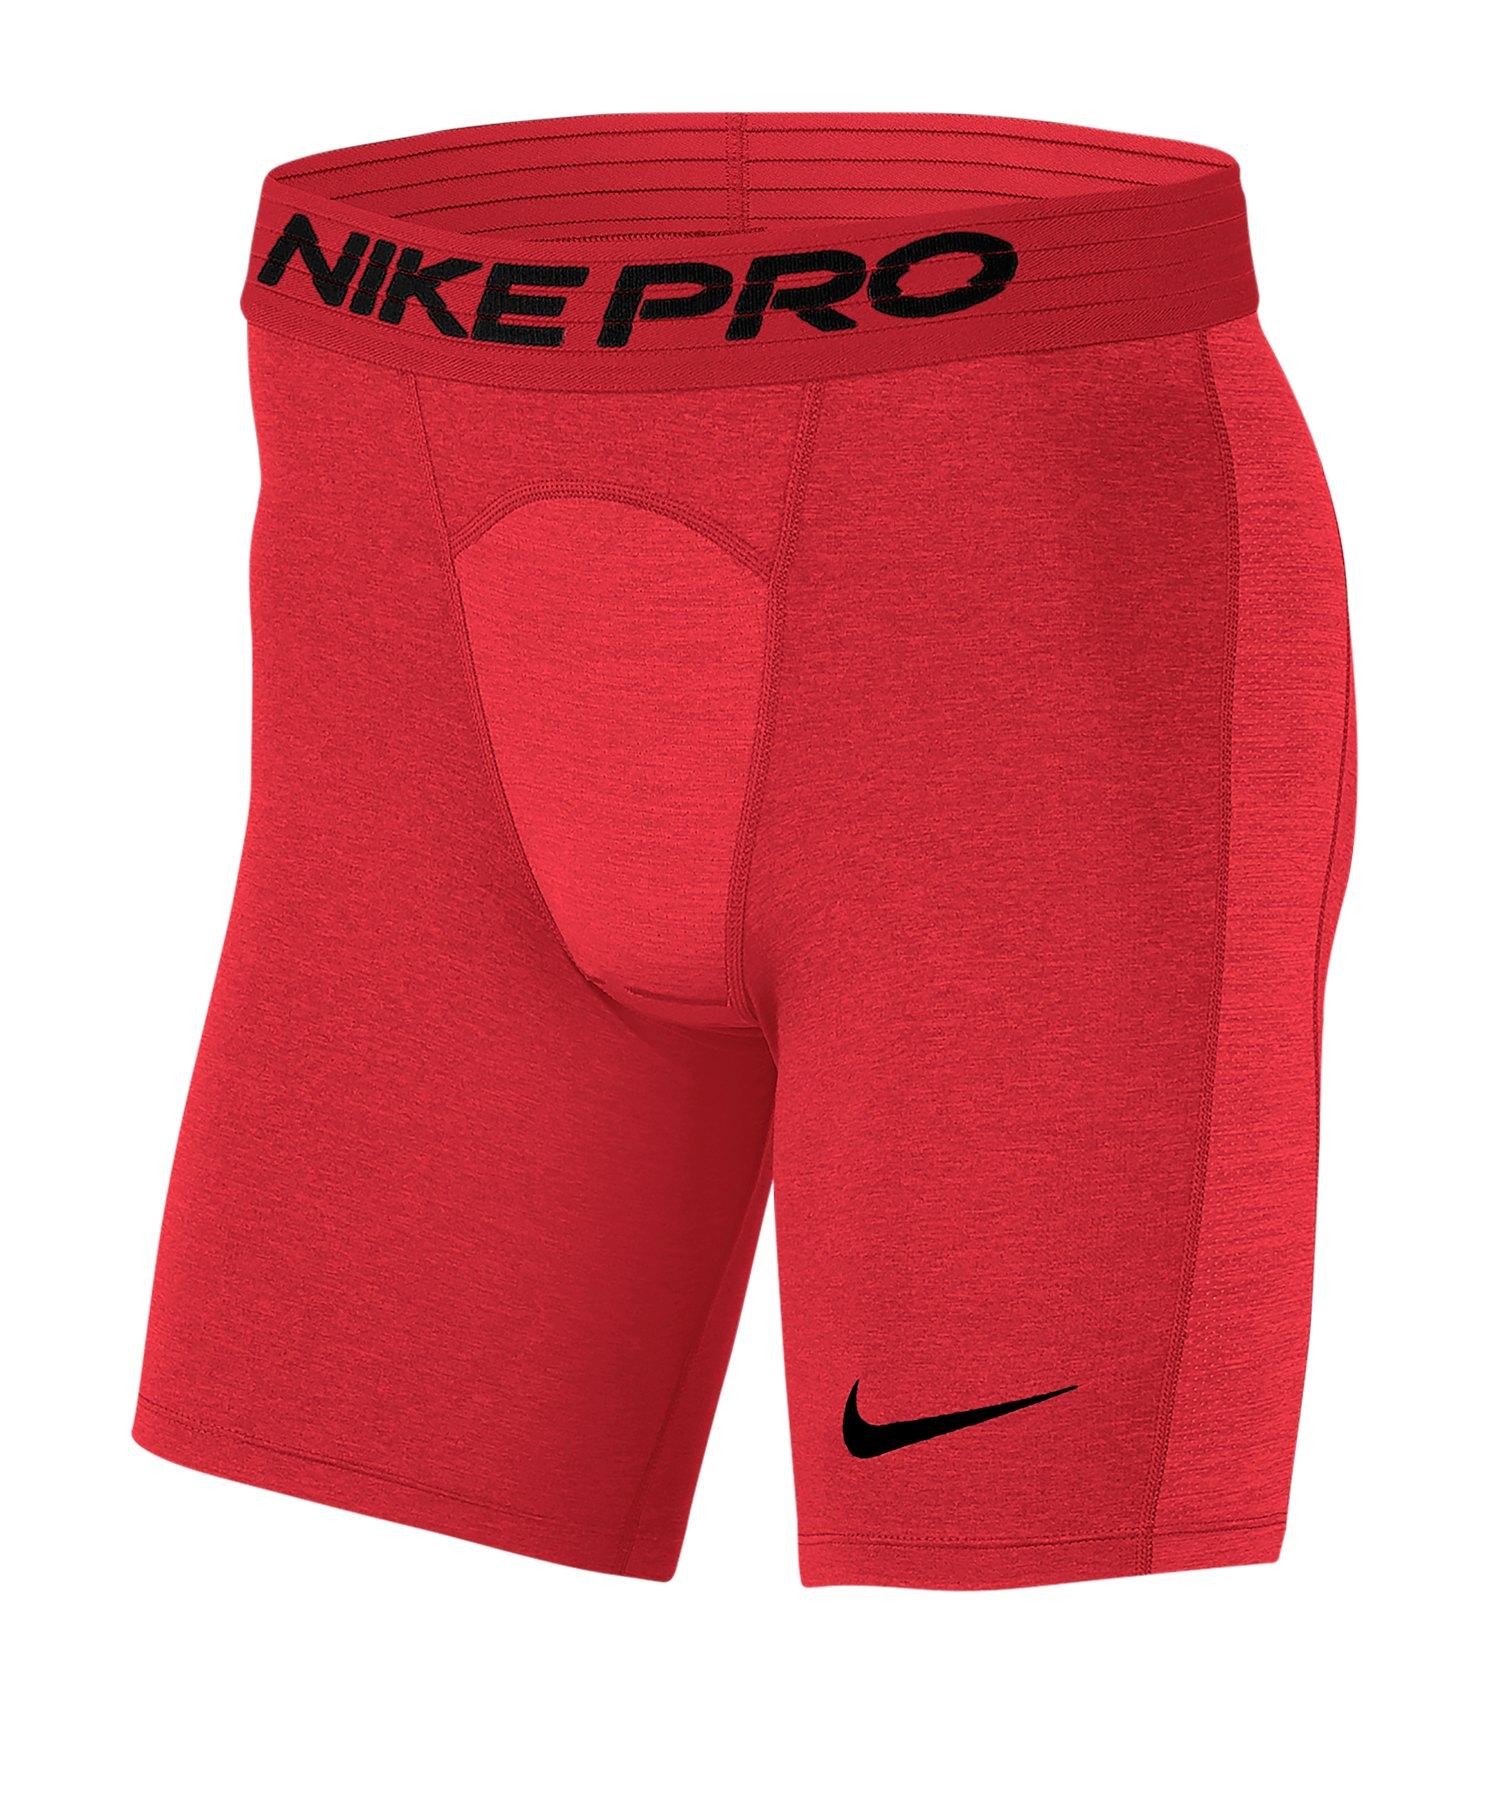 Nike Pro Short Rot F657 - rot